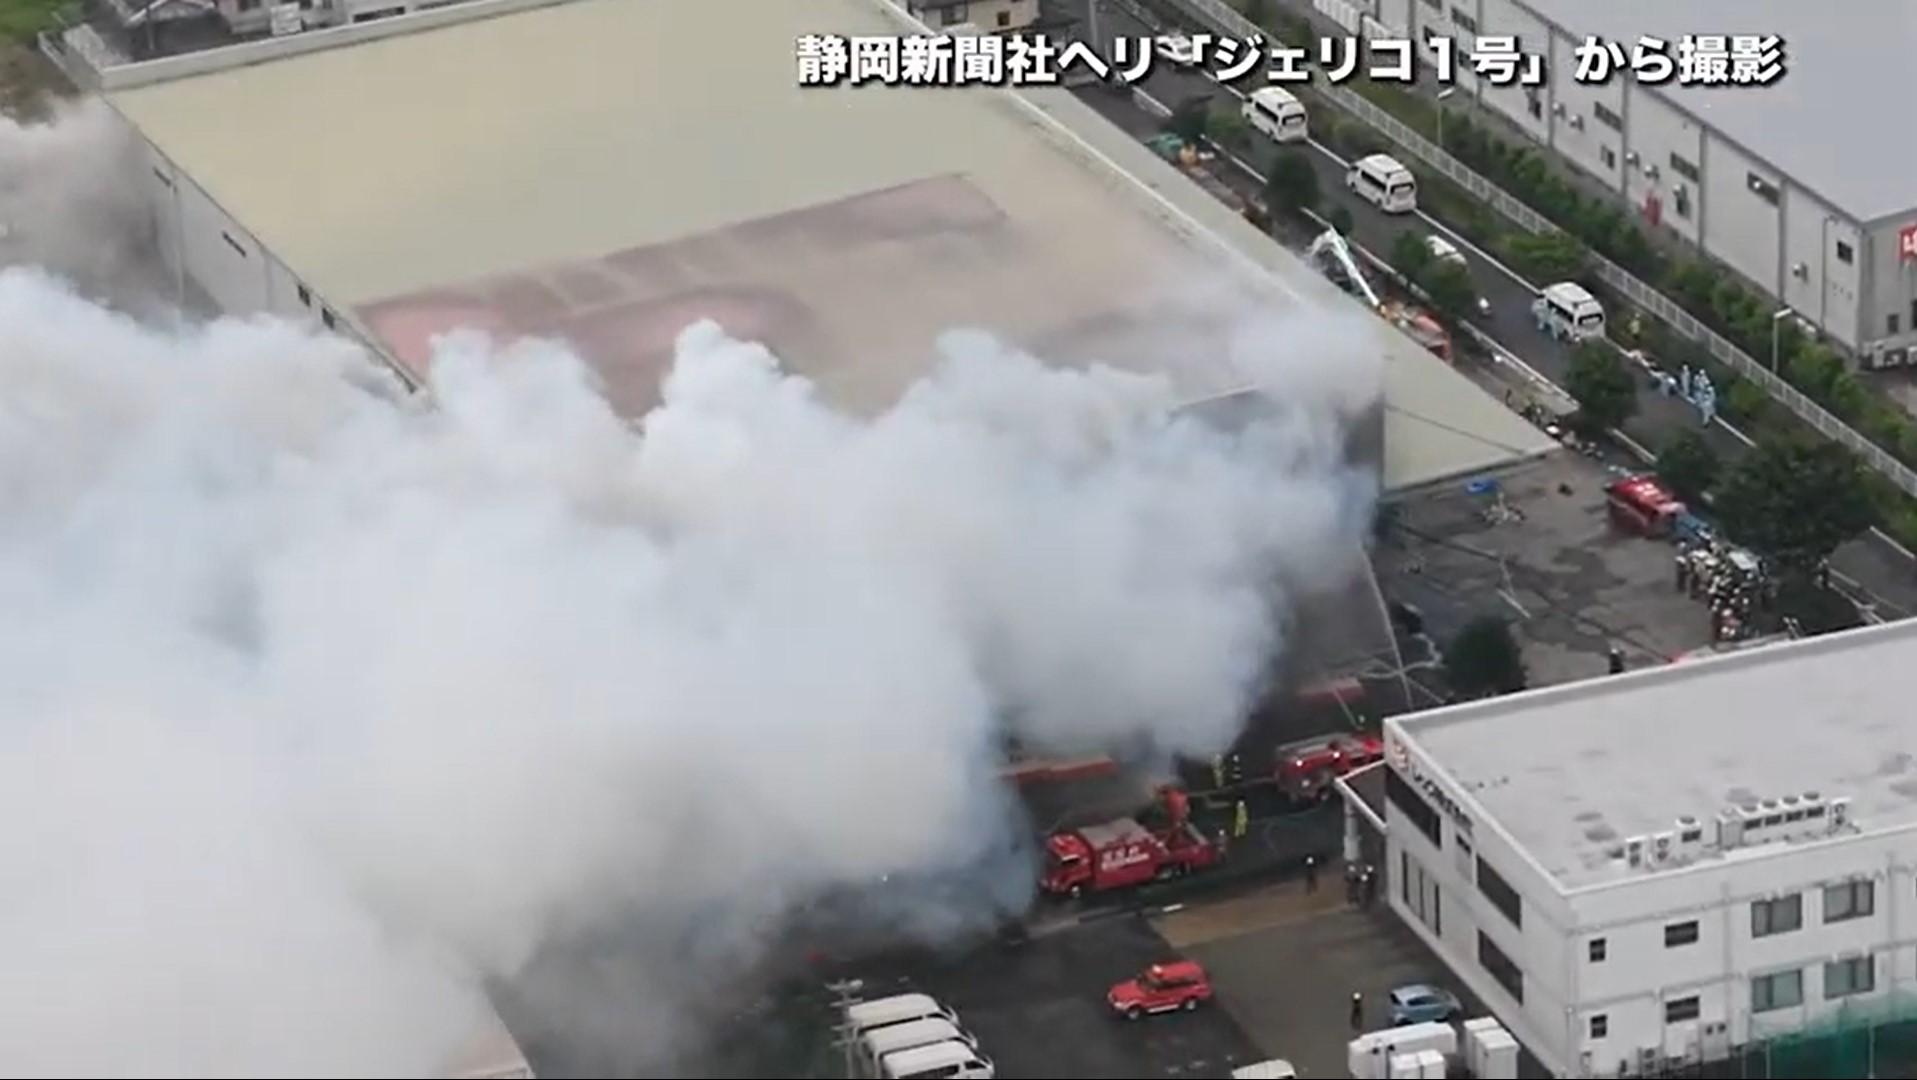 4 Emergency Responders Missing in Japanese Warehouse Fire